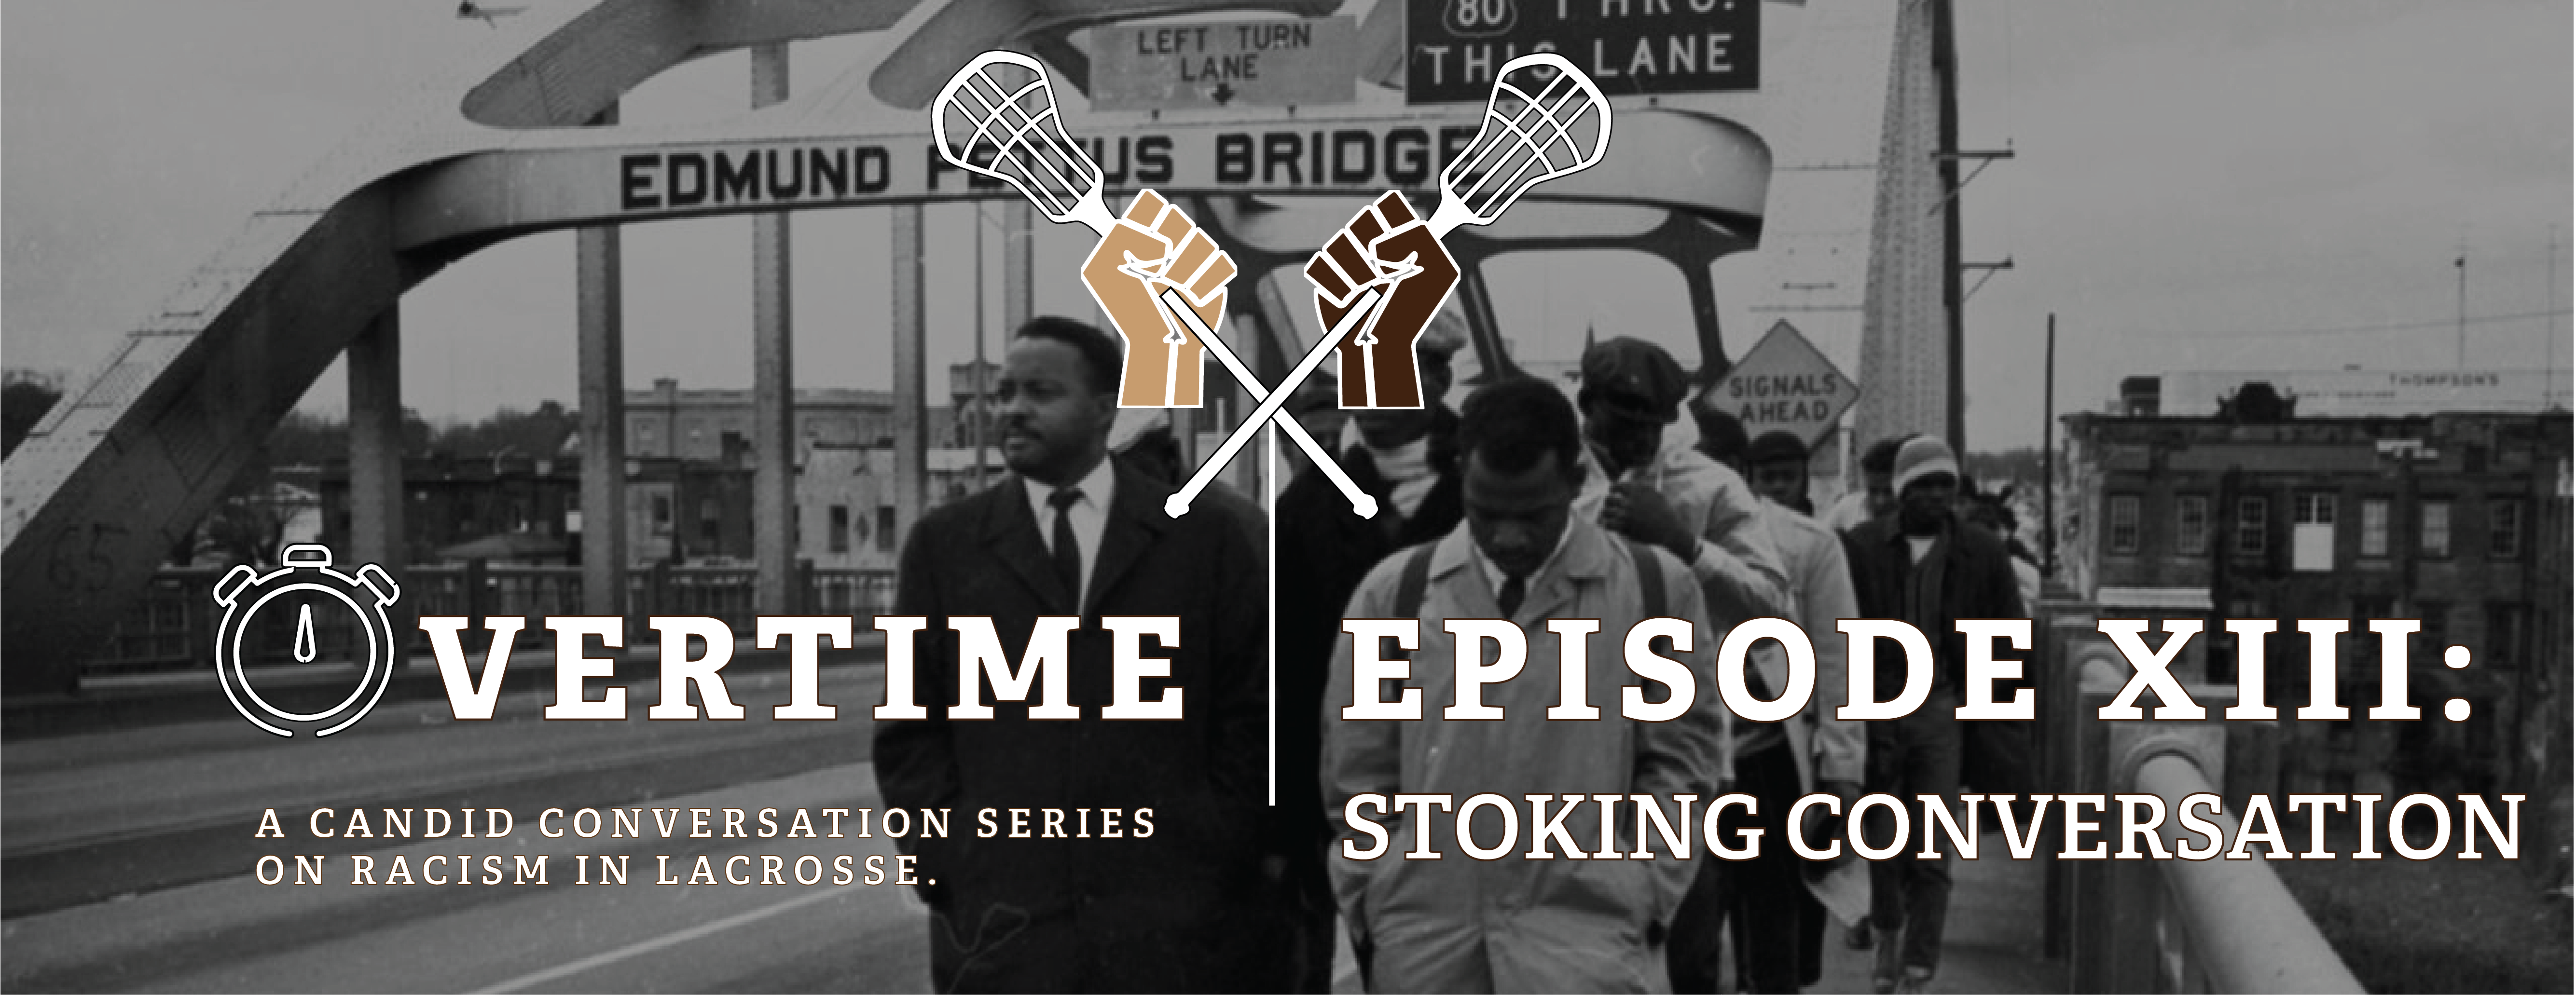 Overtime Episode 13 - Stoking Conversation